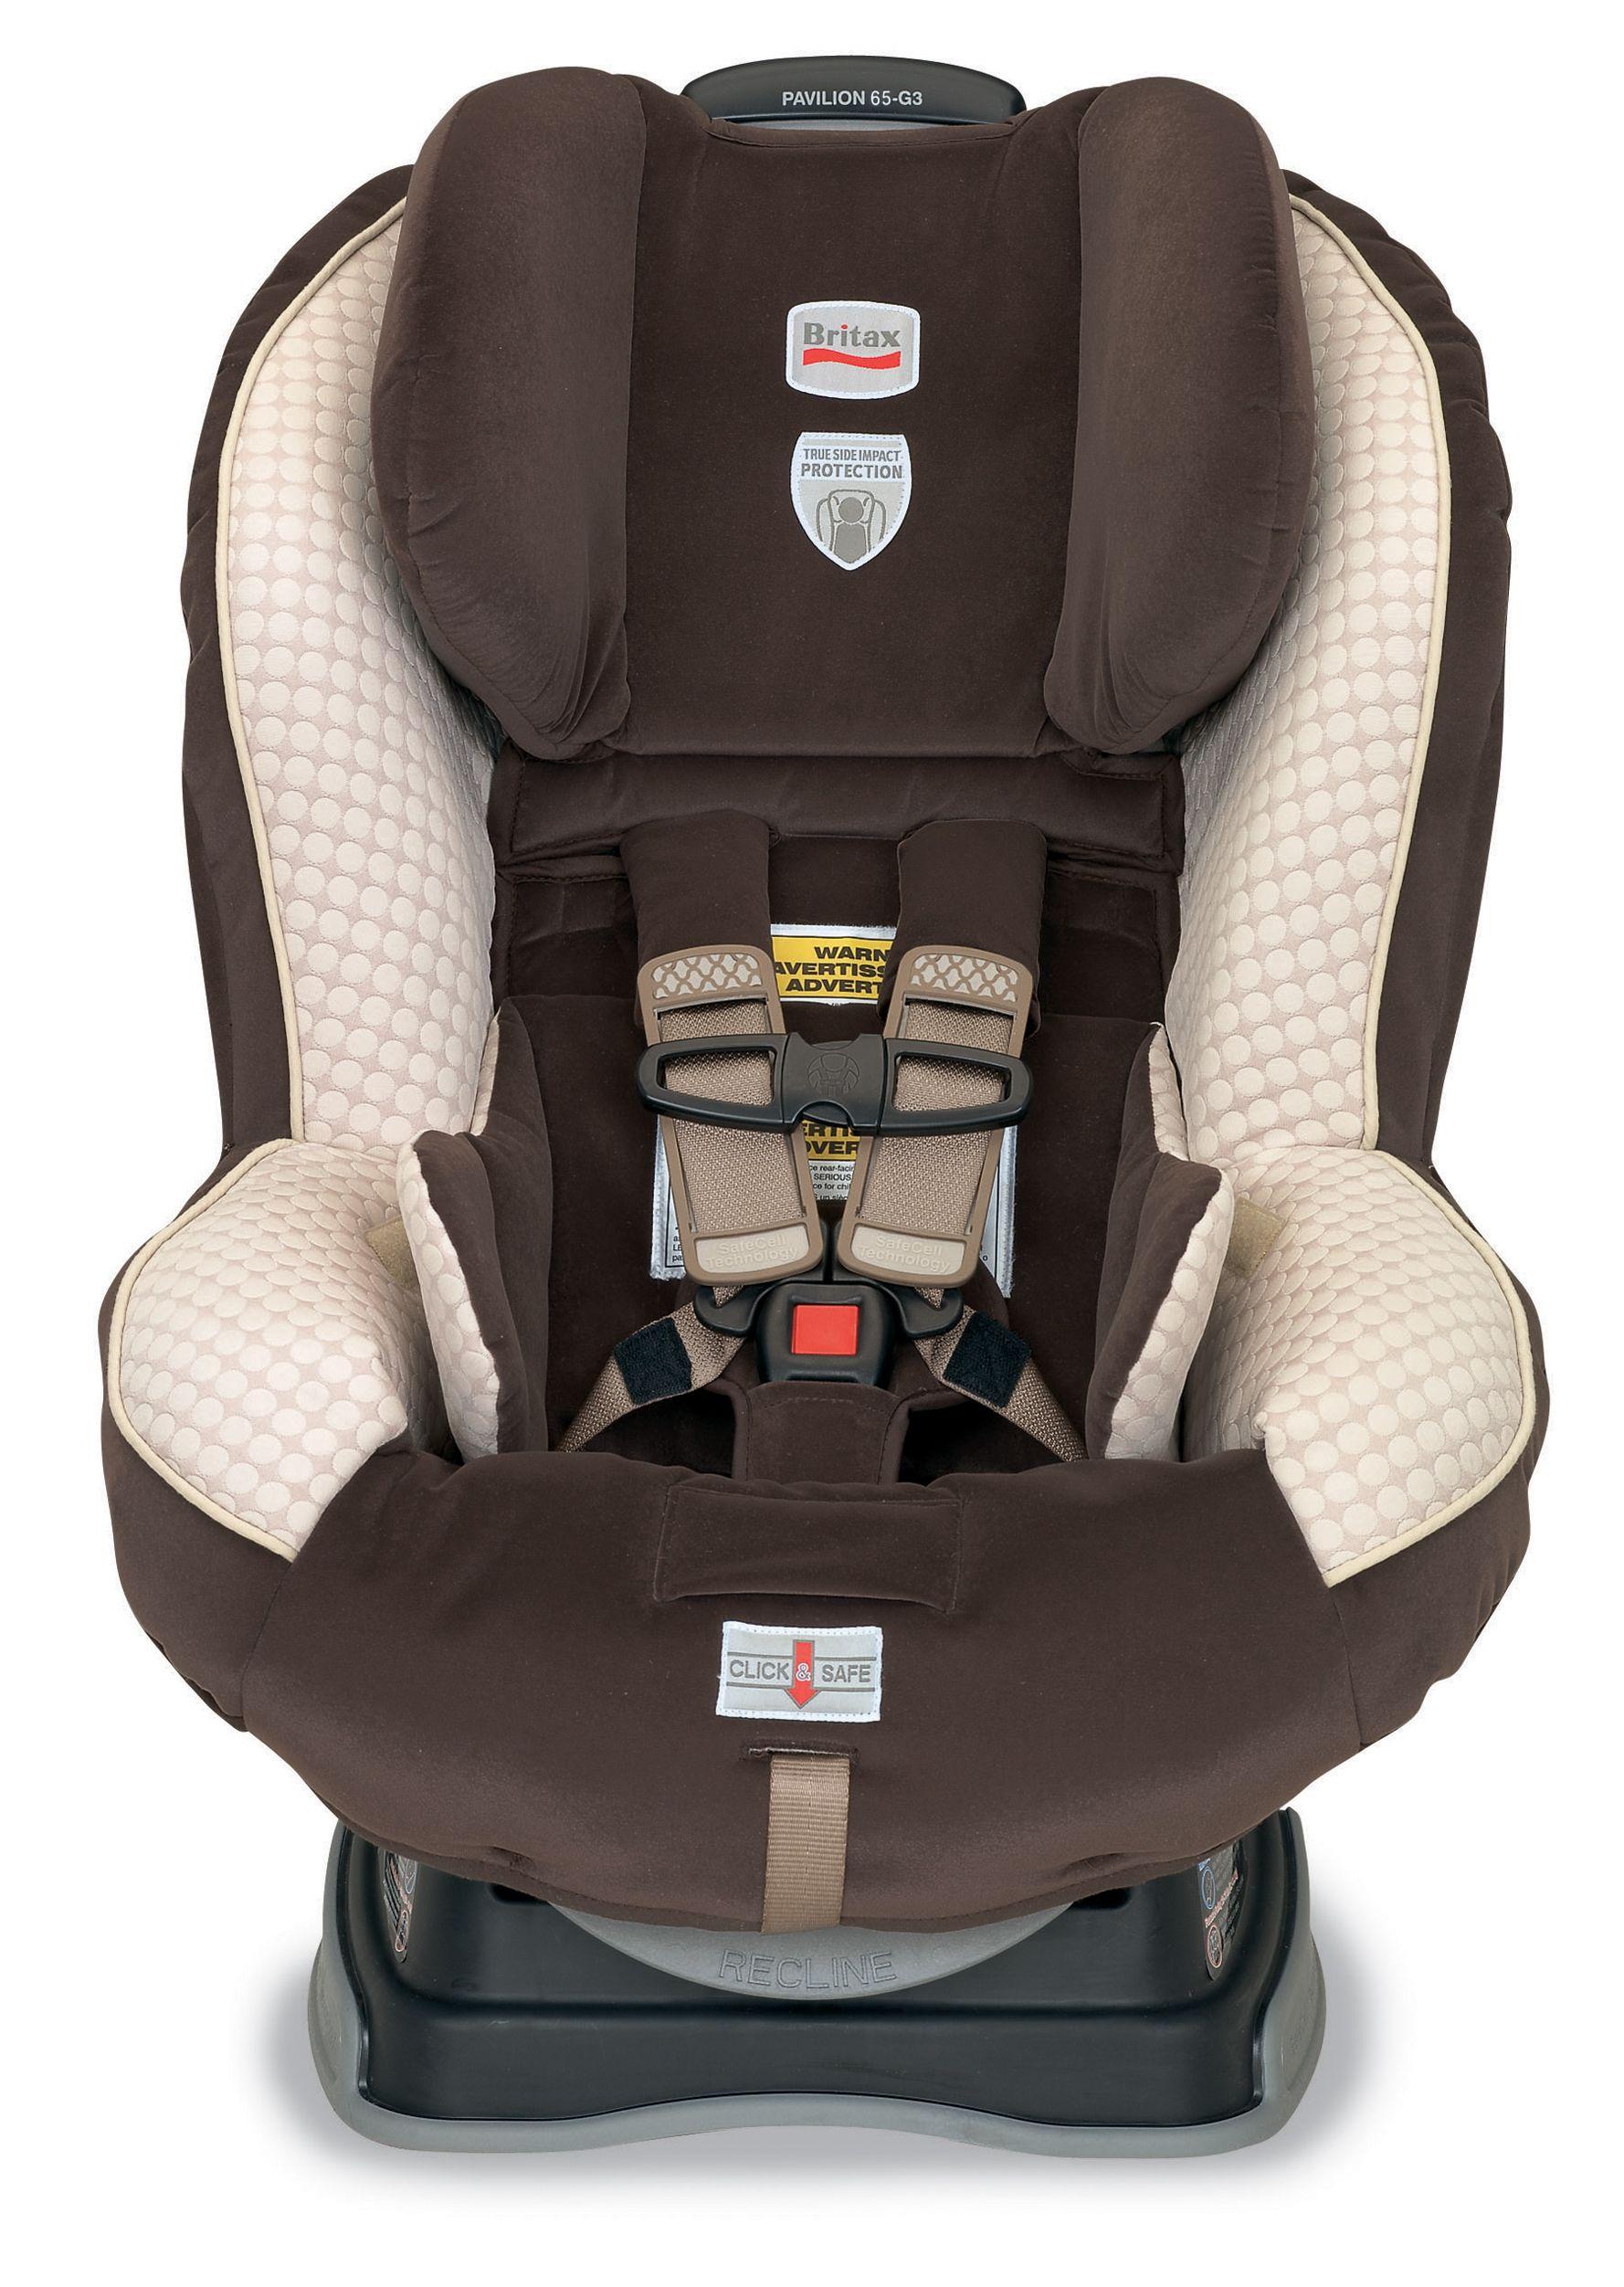 Britax Pavilion 65 Biscotti Car Seats Britax Baby Car Seats